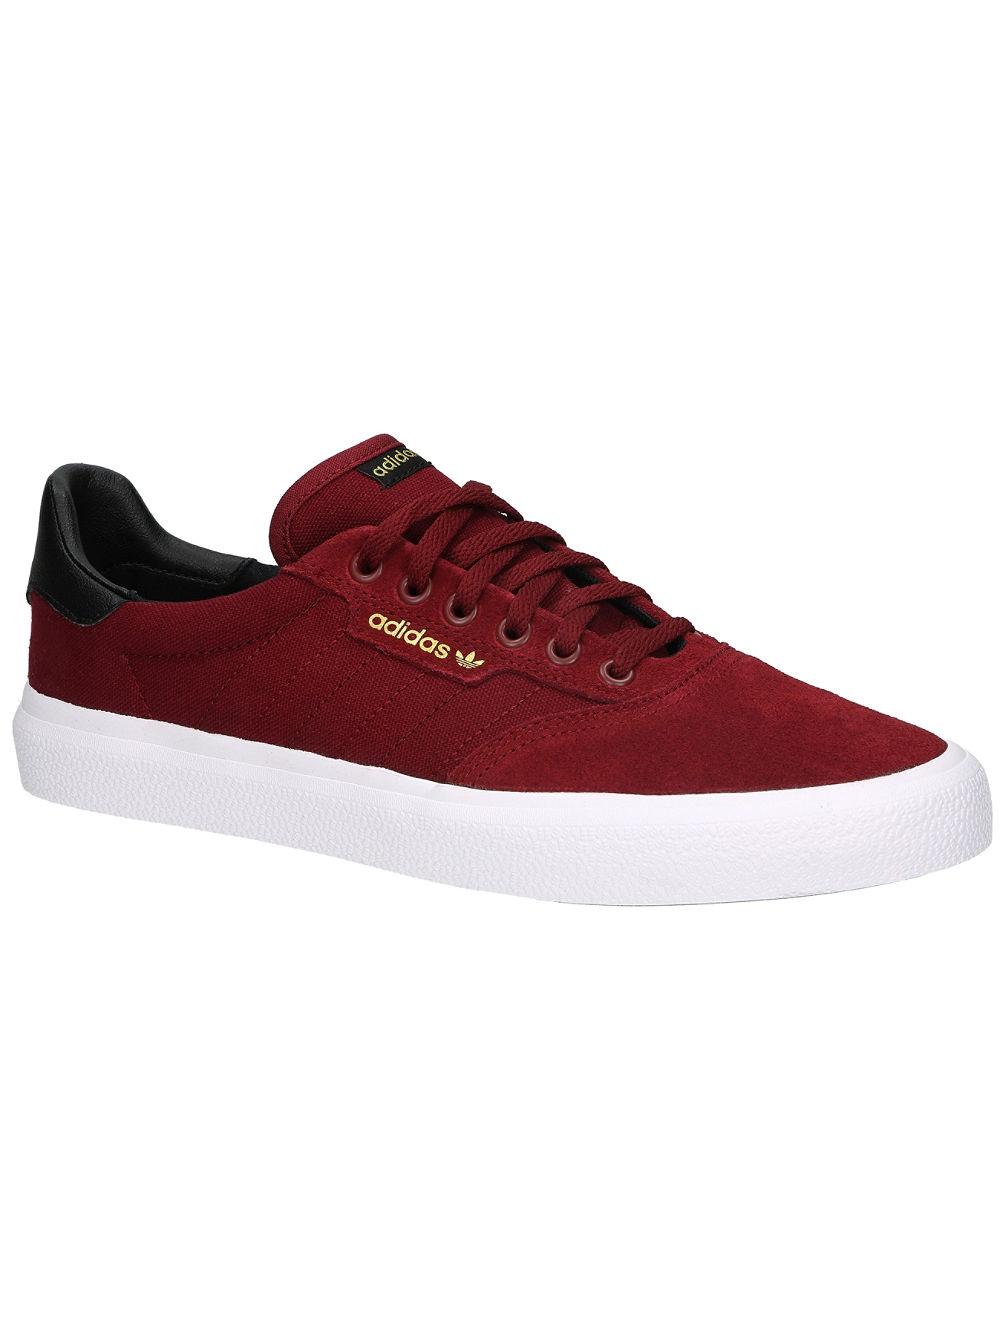 newest f606c caa92 adidas Skateboarding 3MC Skate Shoes